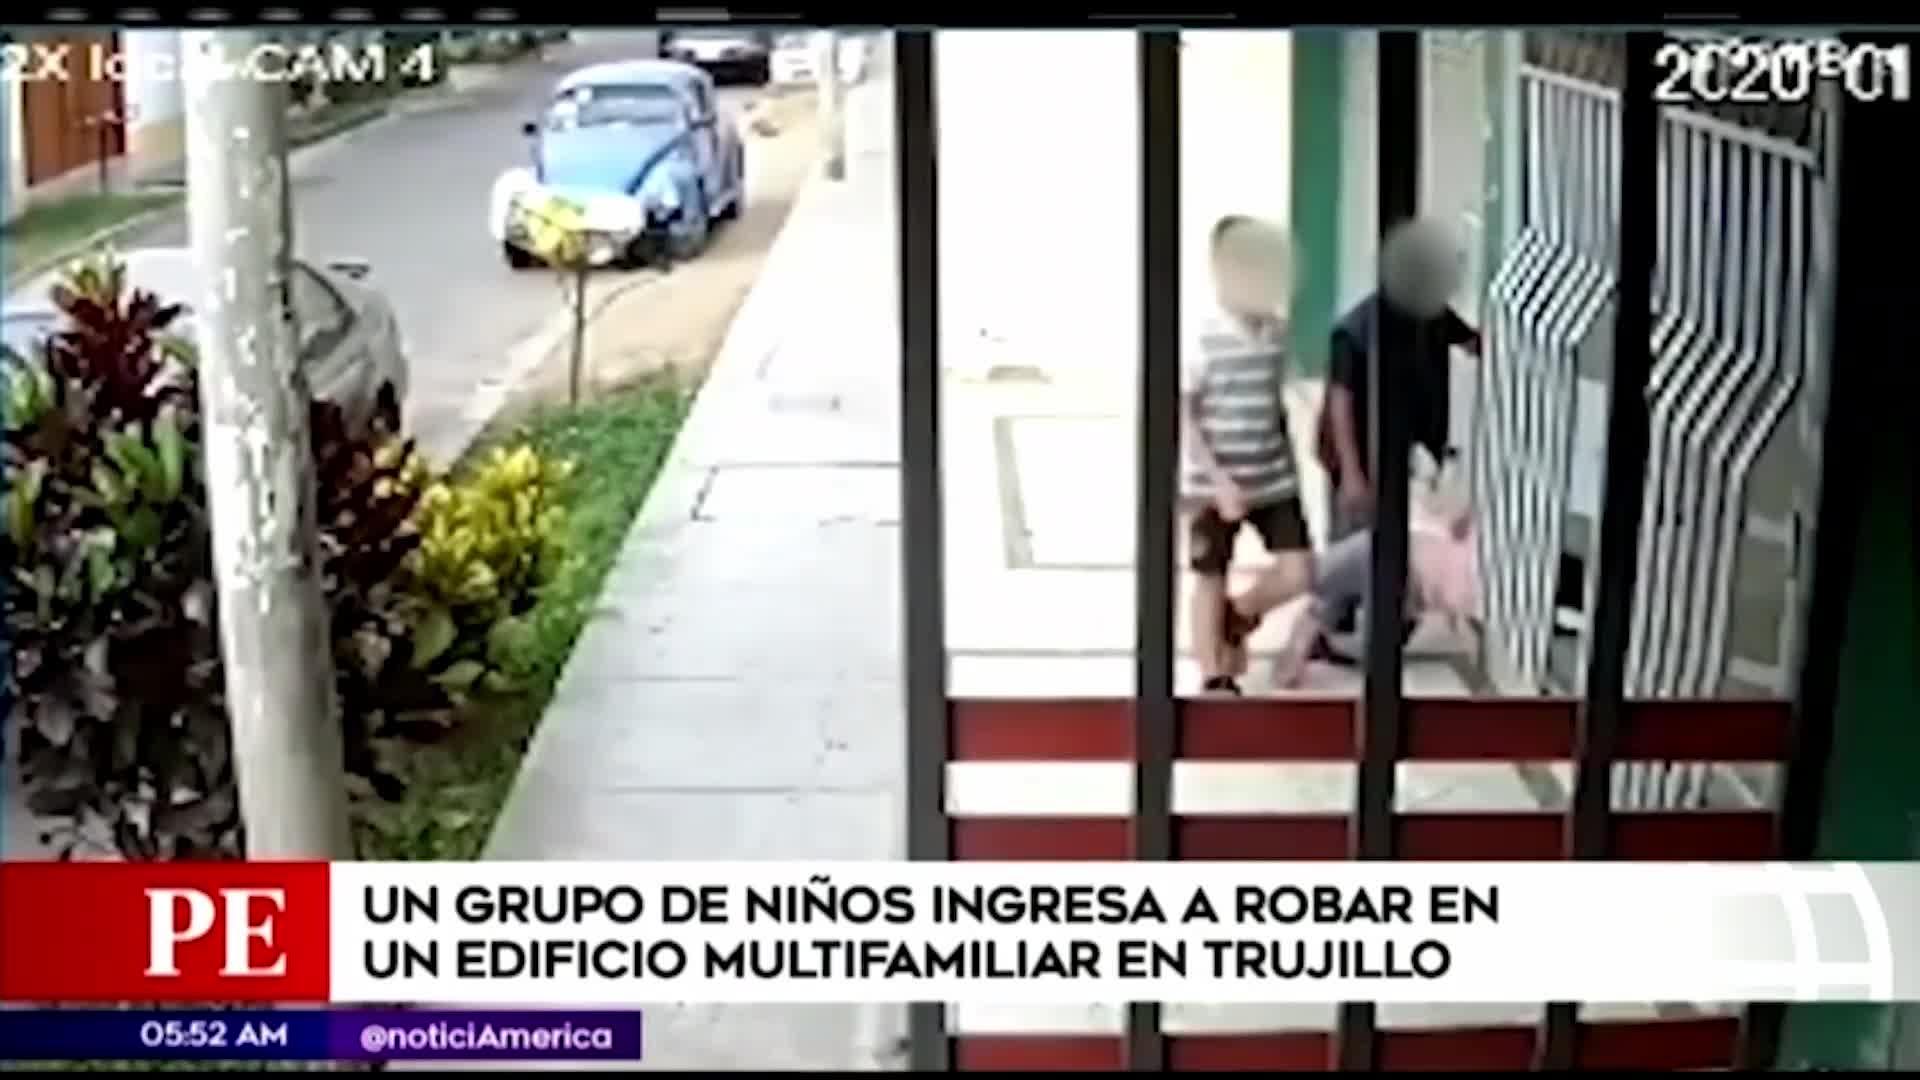 Trujillo: un grupo de niños ingresaron a un edificio multifamiliar para robar